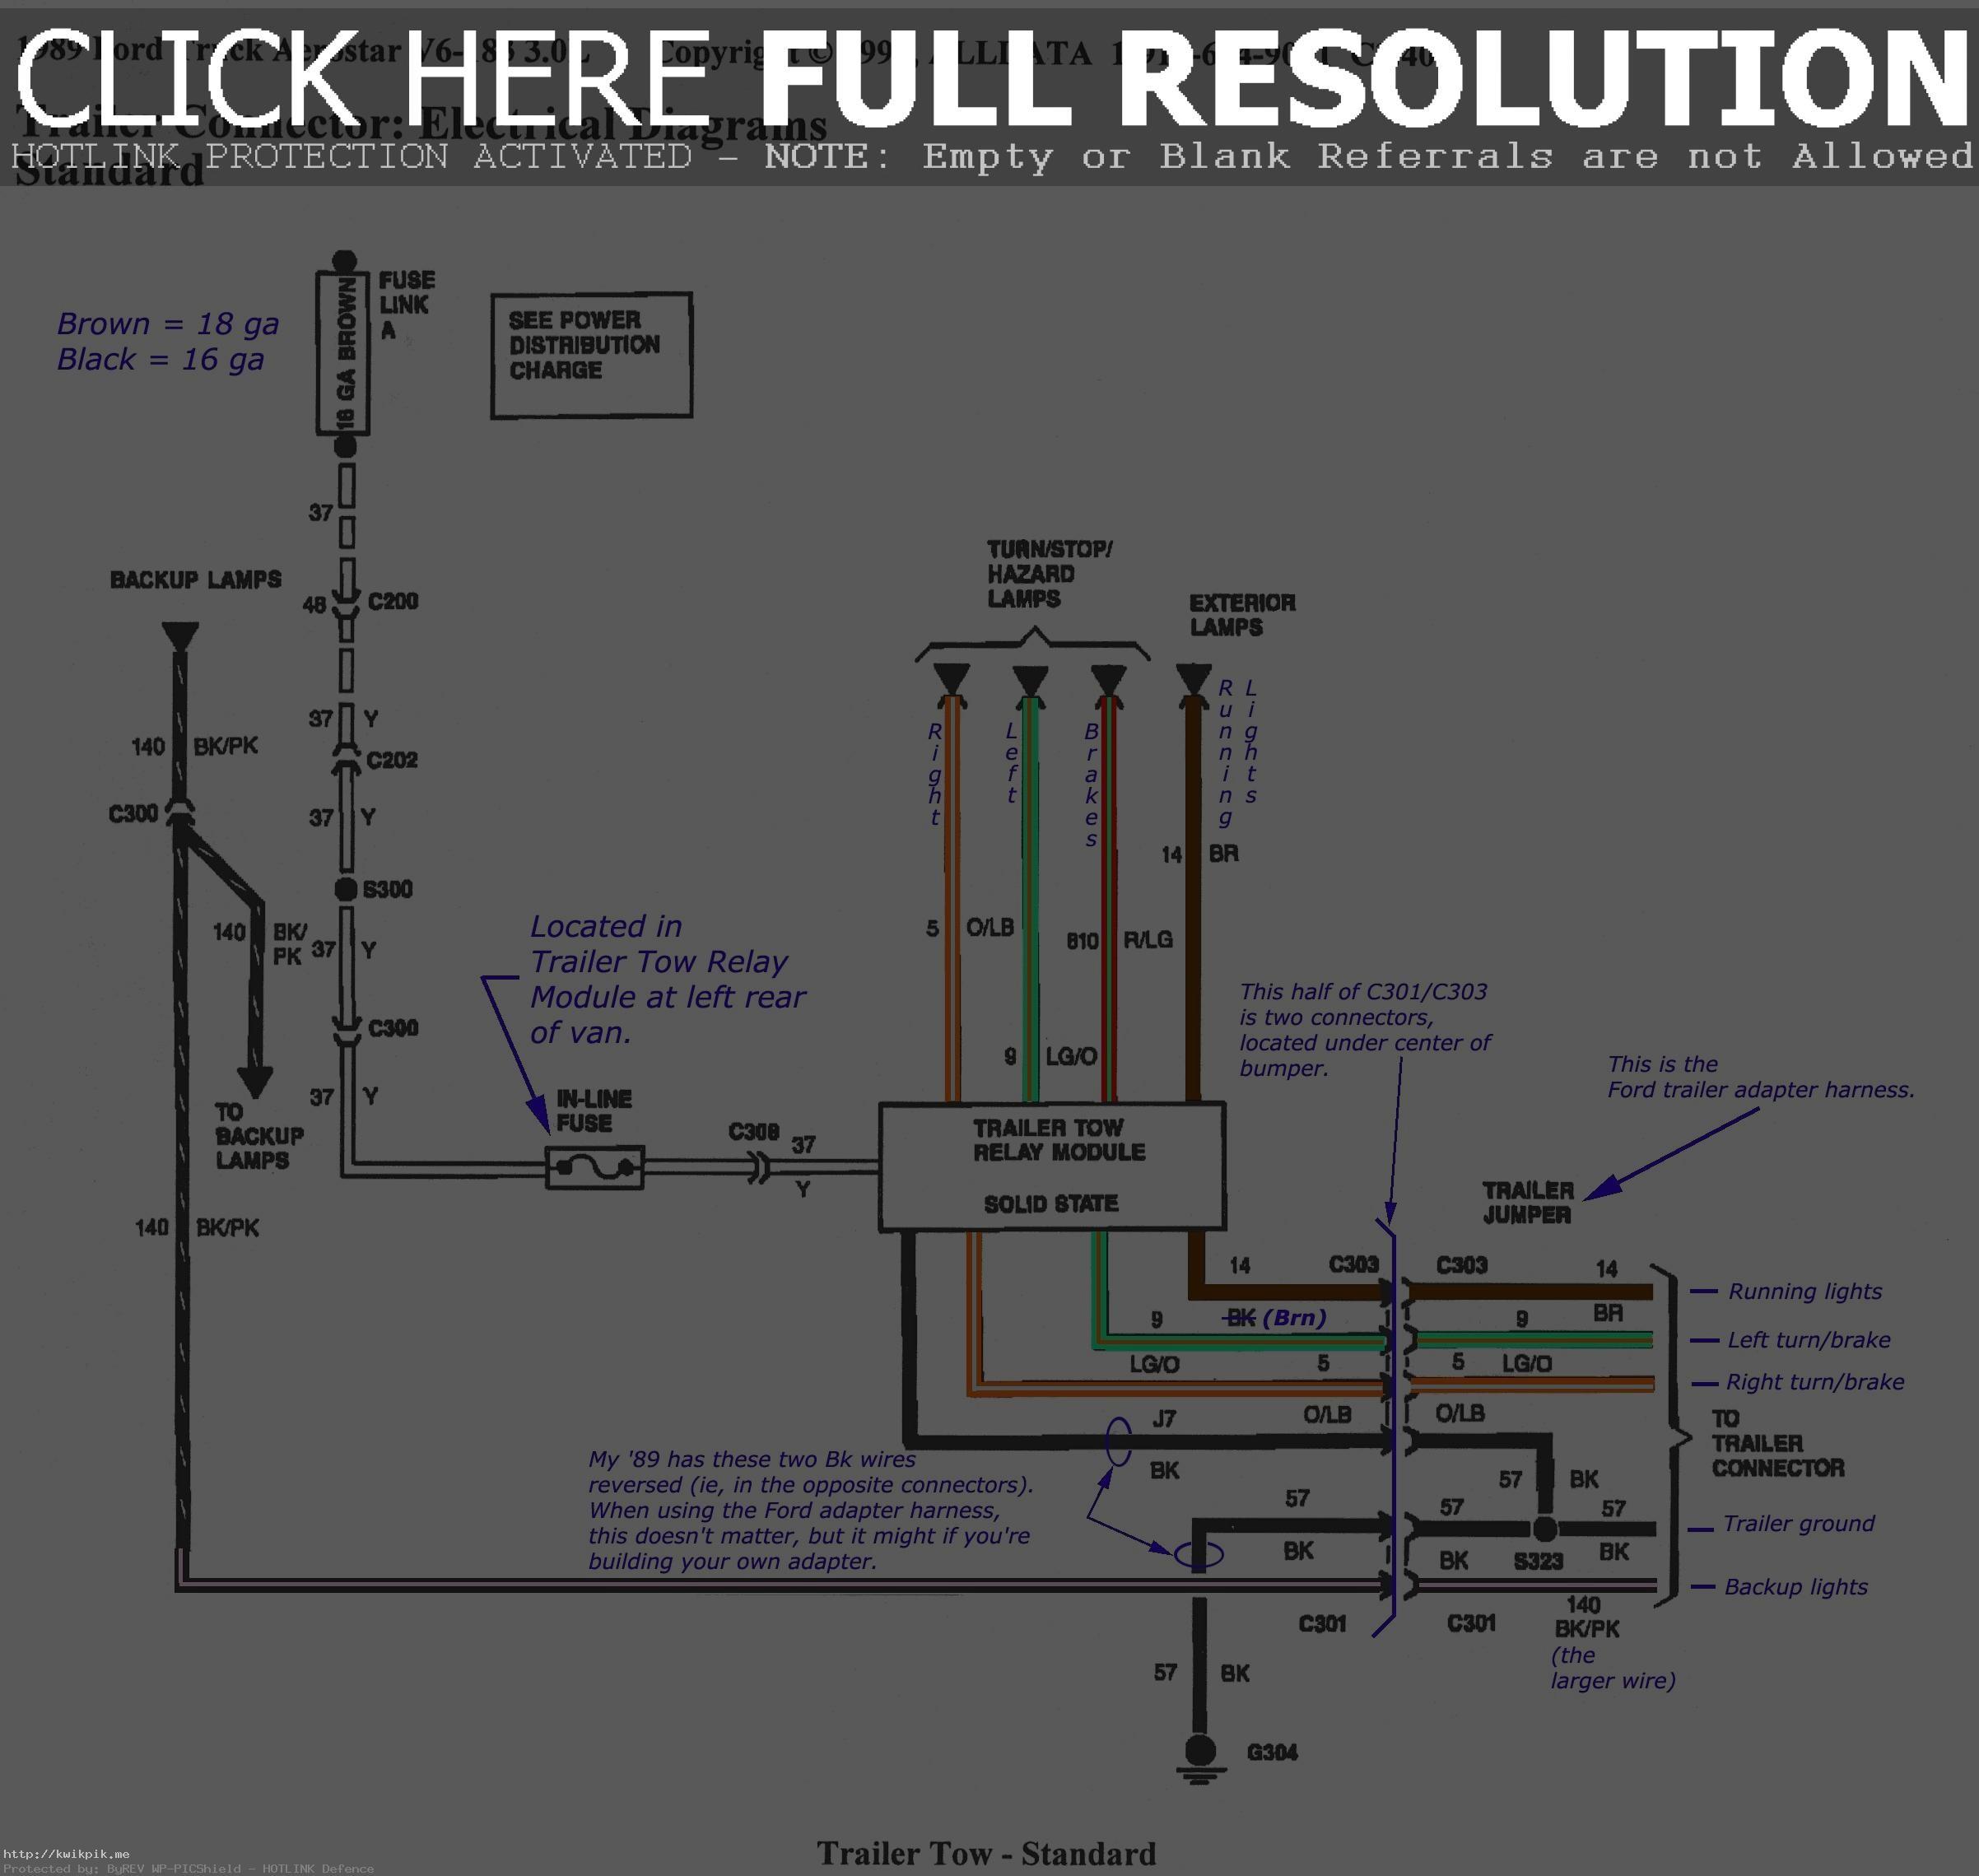 Toyota Tundra Trailer Wiring Harness Diagram Siemreaprestaurant Me